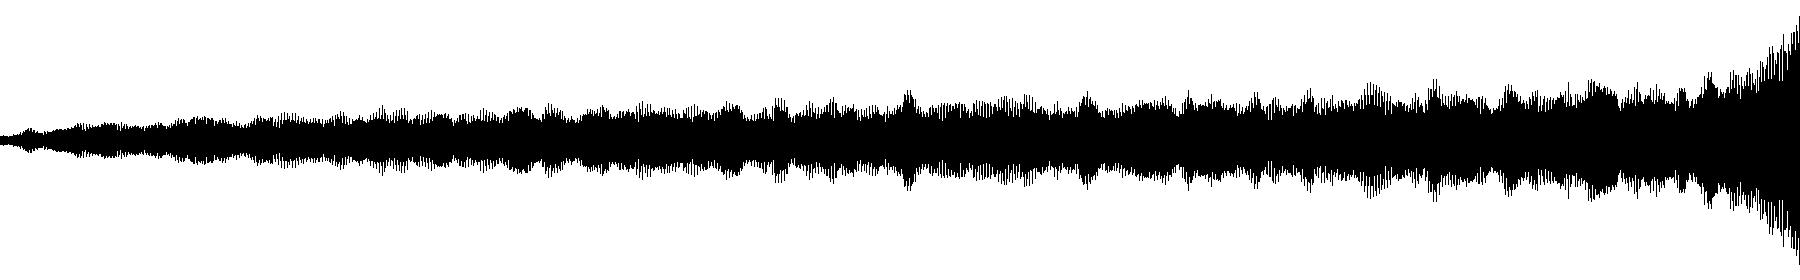 vuf1 140bpm trance athmo 2 8bars f